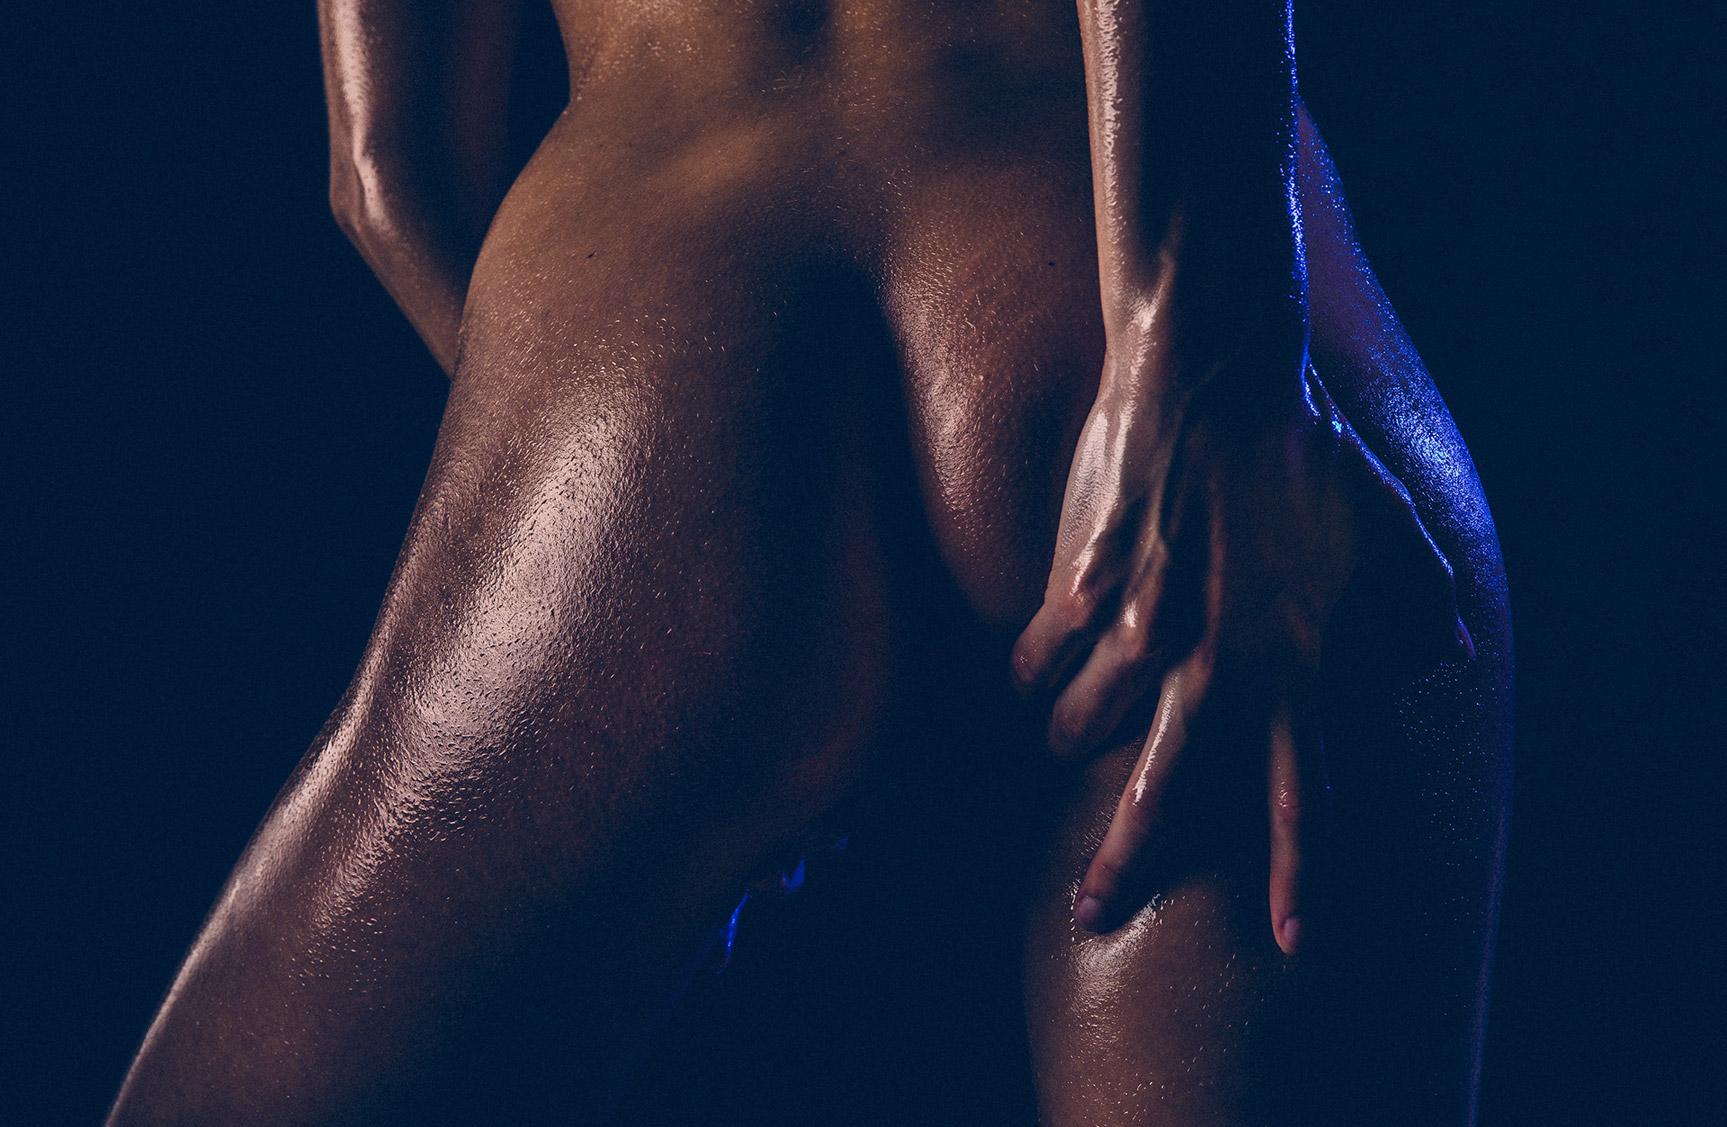 Мокрая голая девушка в фотосерии Wet chocolate by Thomas Agatz